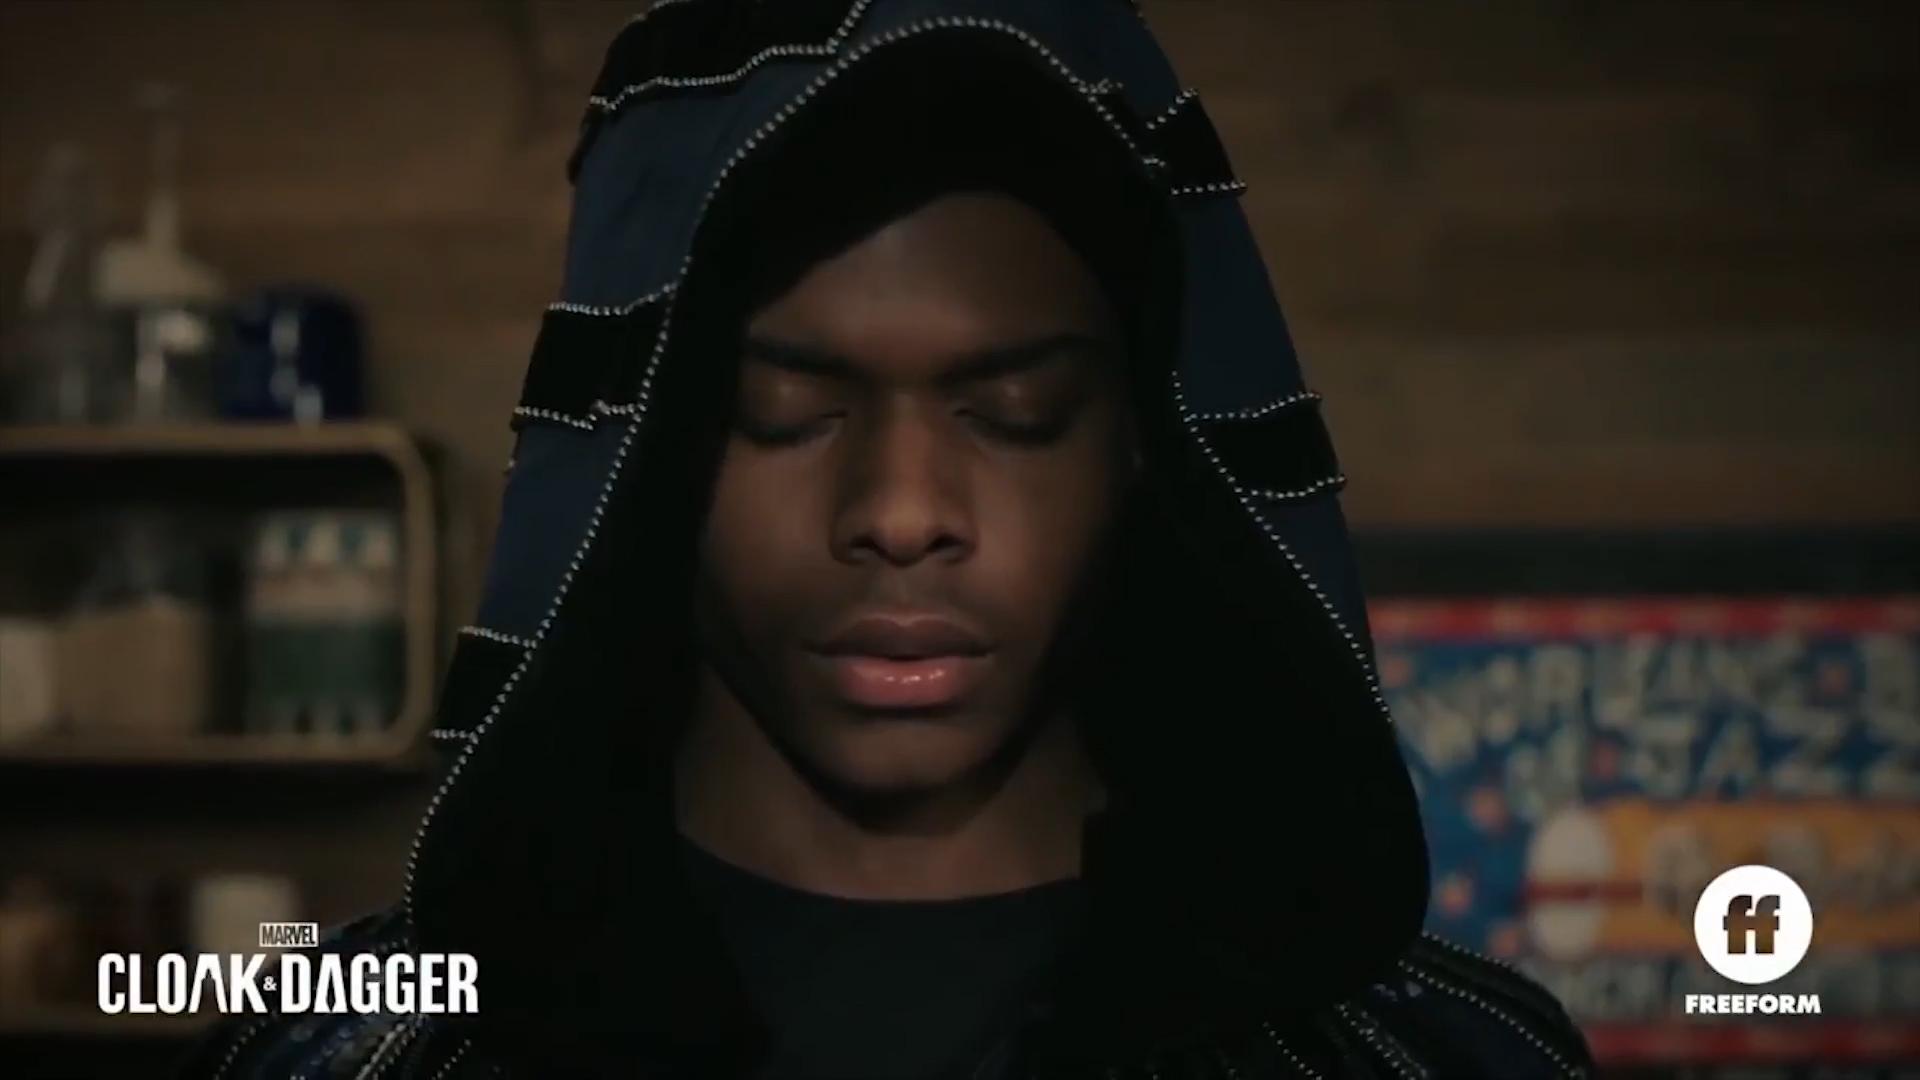 Cloak & Dagger S1 E8 Trailer